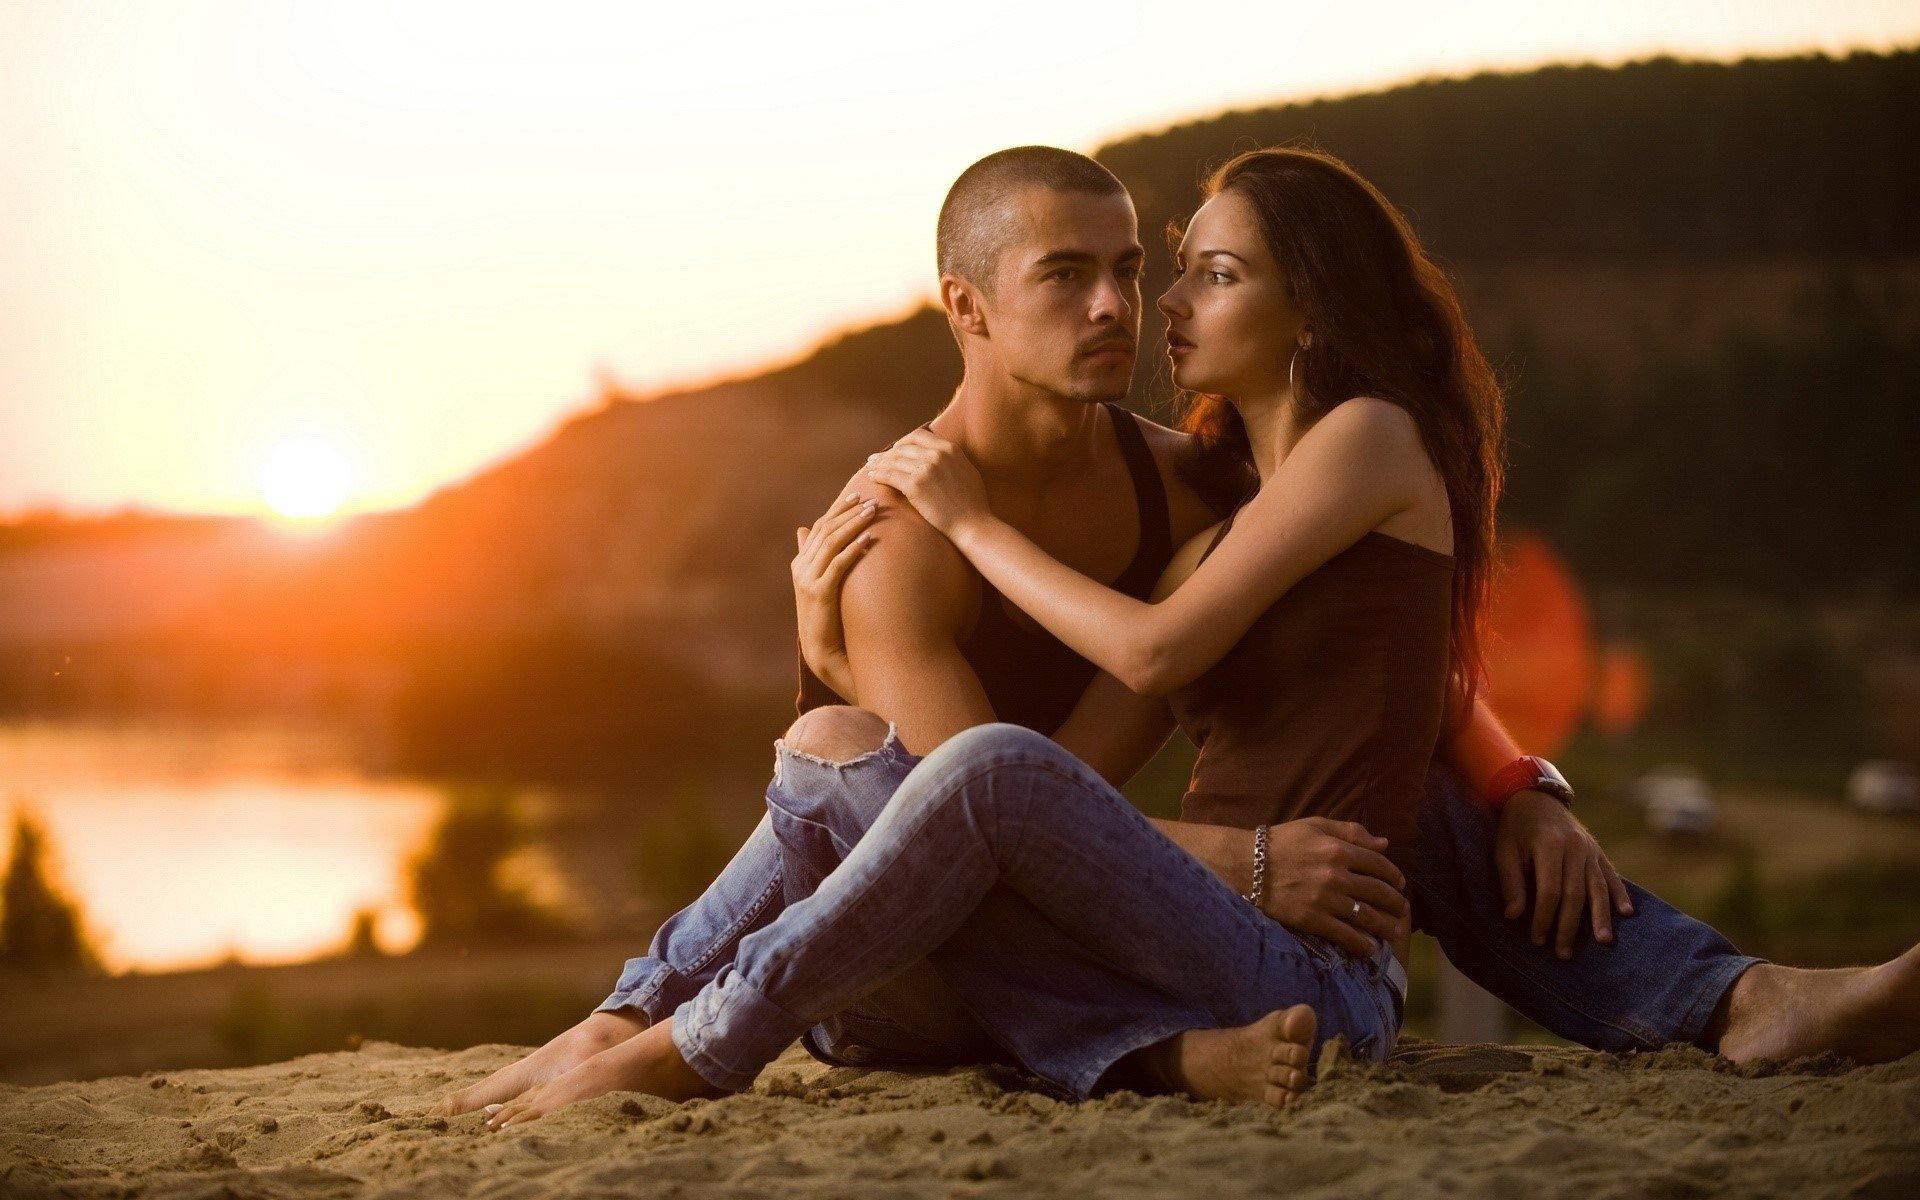 couple-love-romance-sunset-720949-wallhere.com